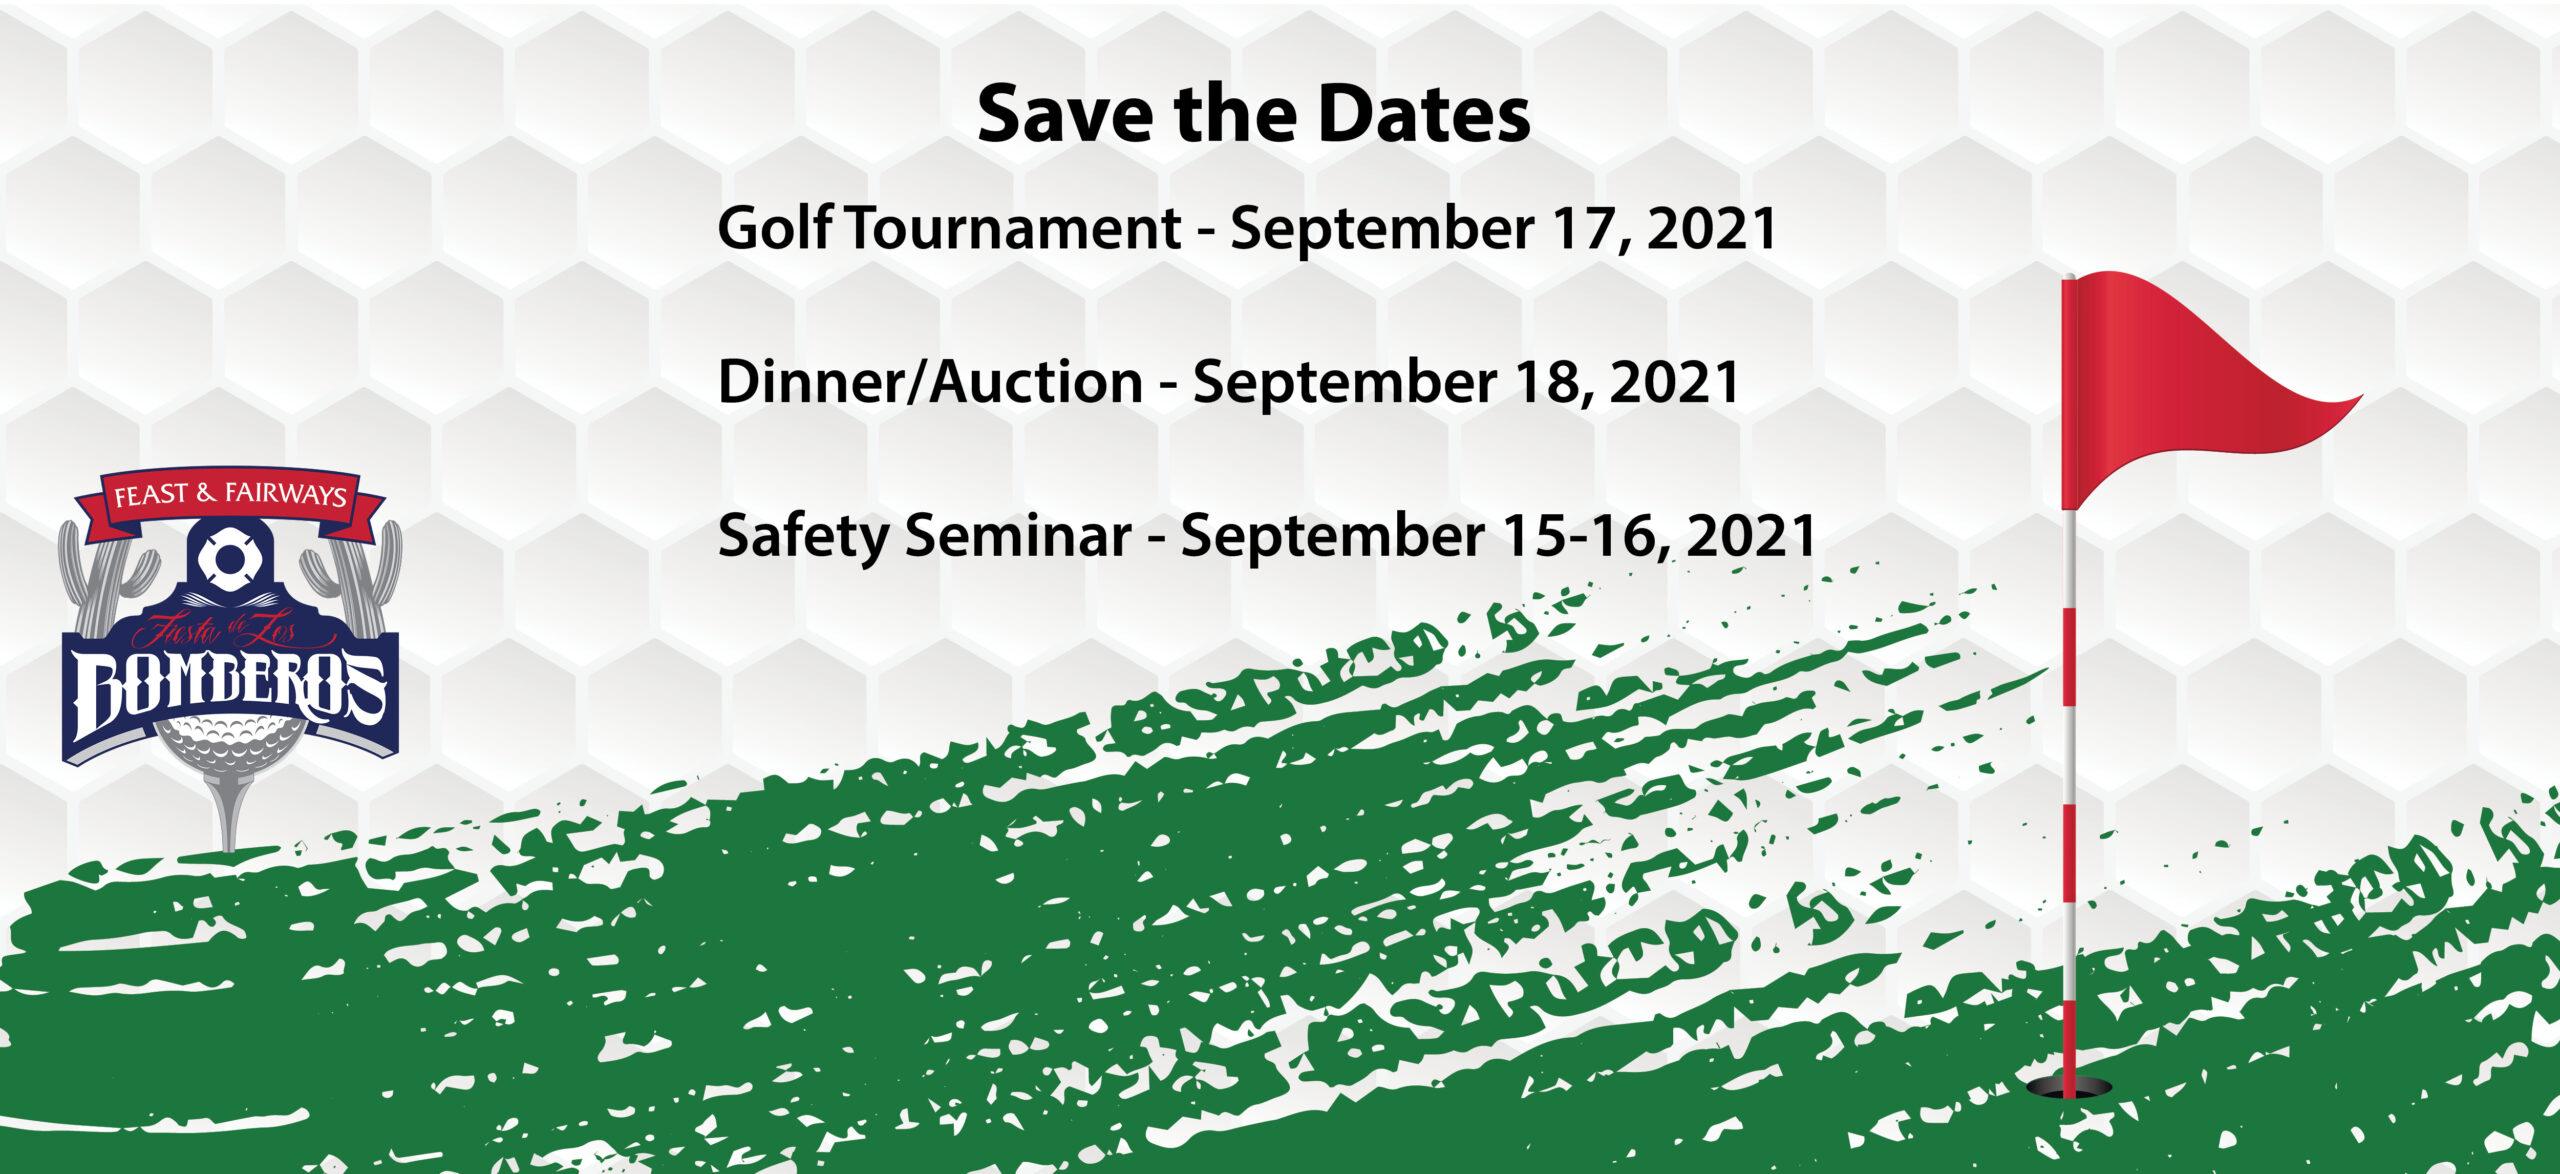 2021 Golf Tournament & Dinner/Auction